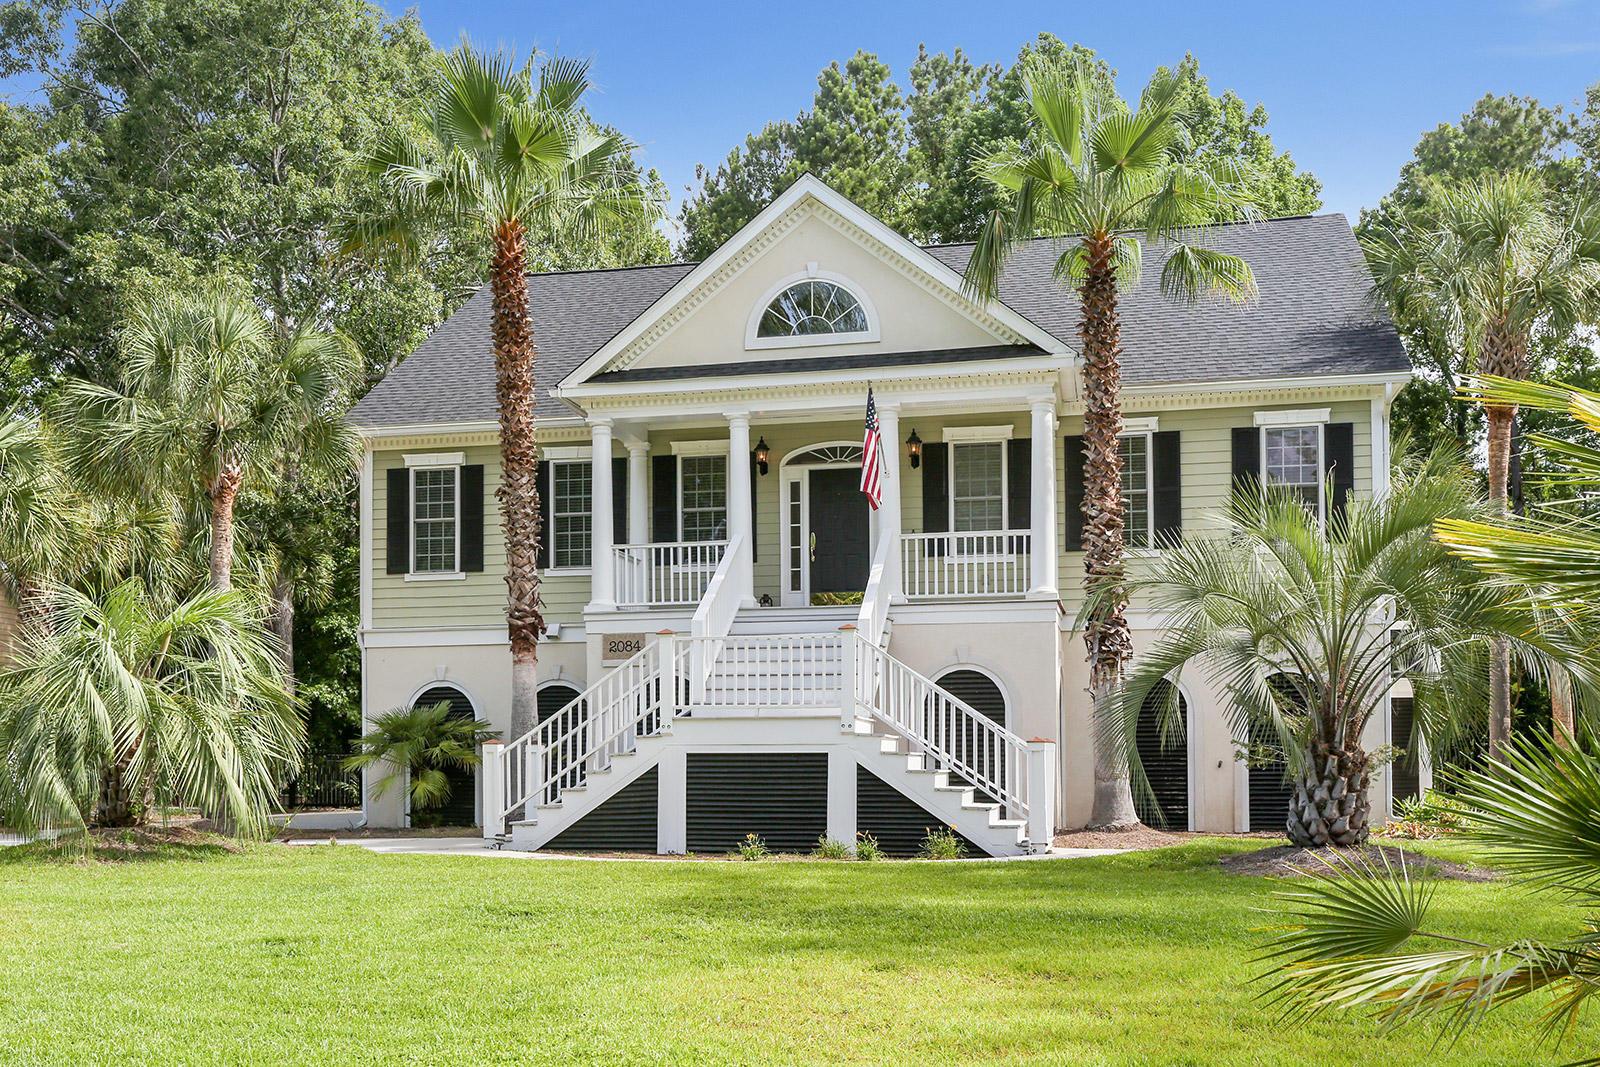 Photo of 2084 Rookery Ln, Charleston, SC 29414